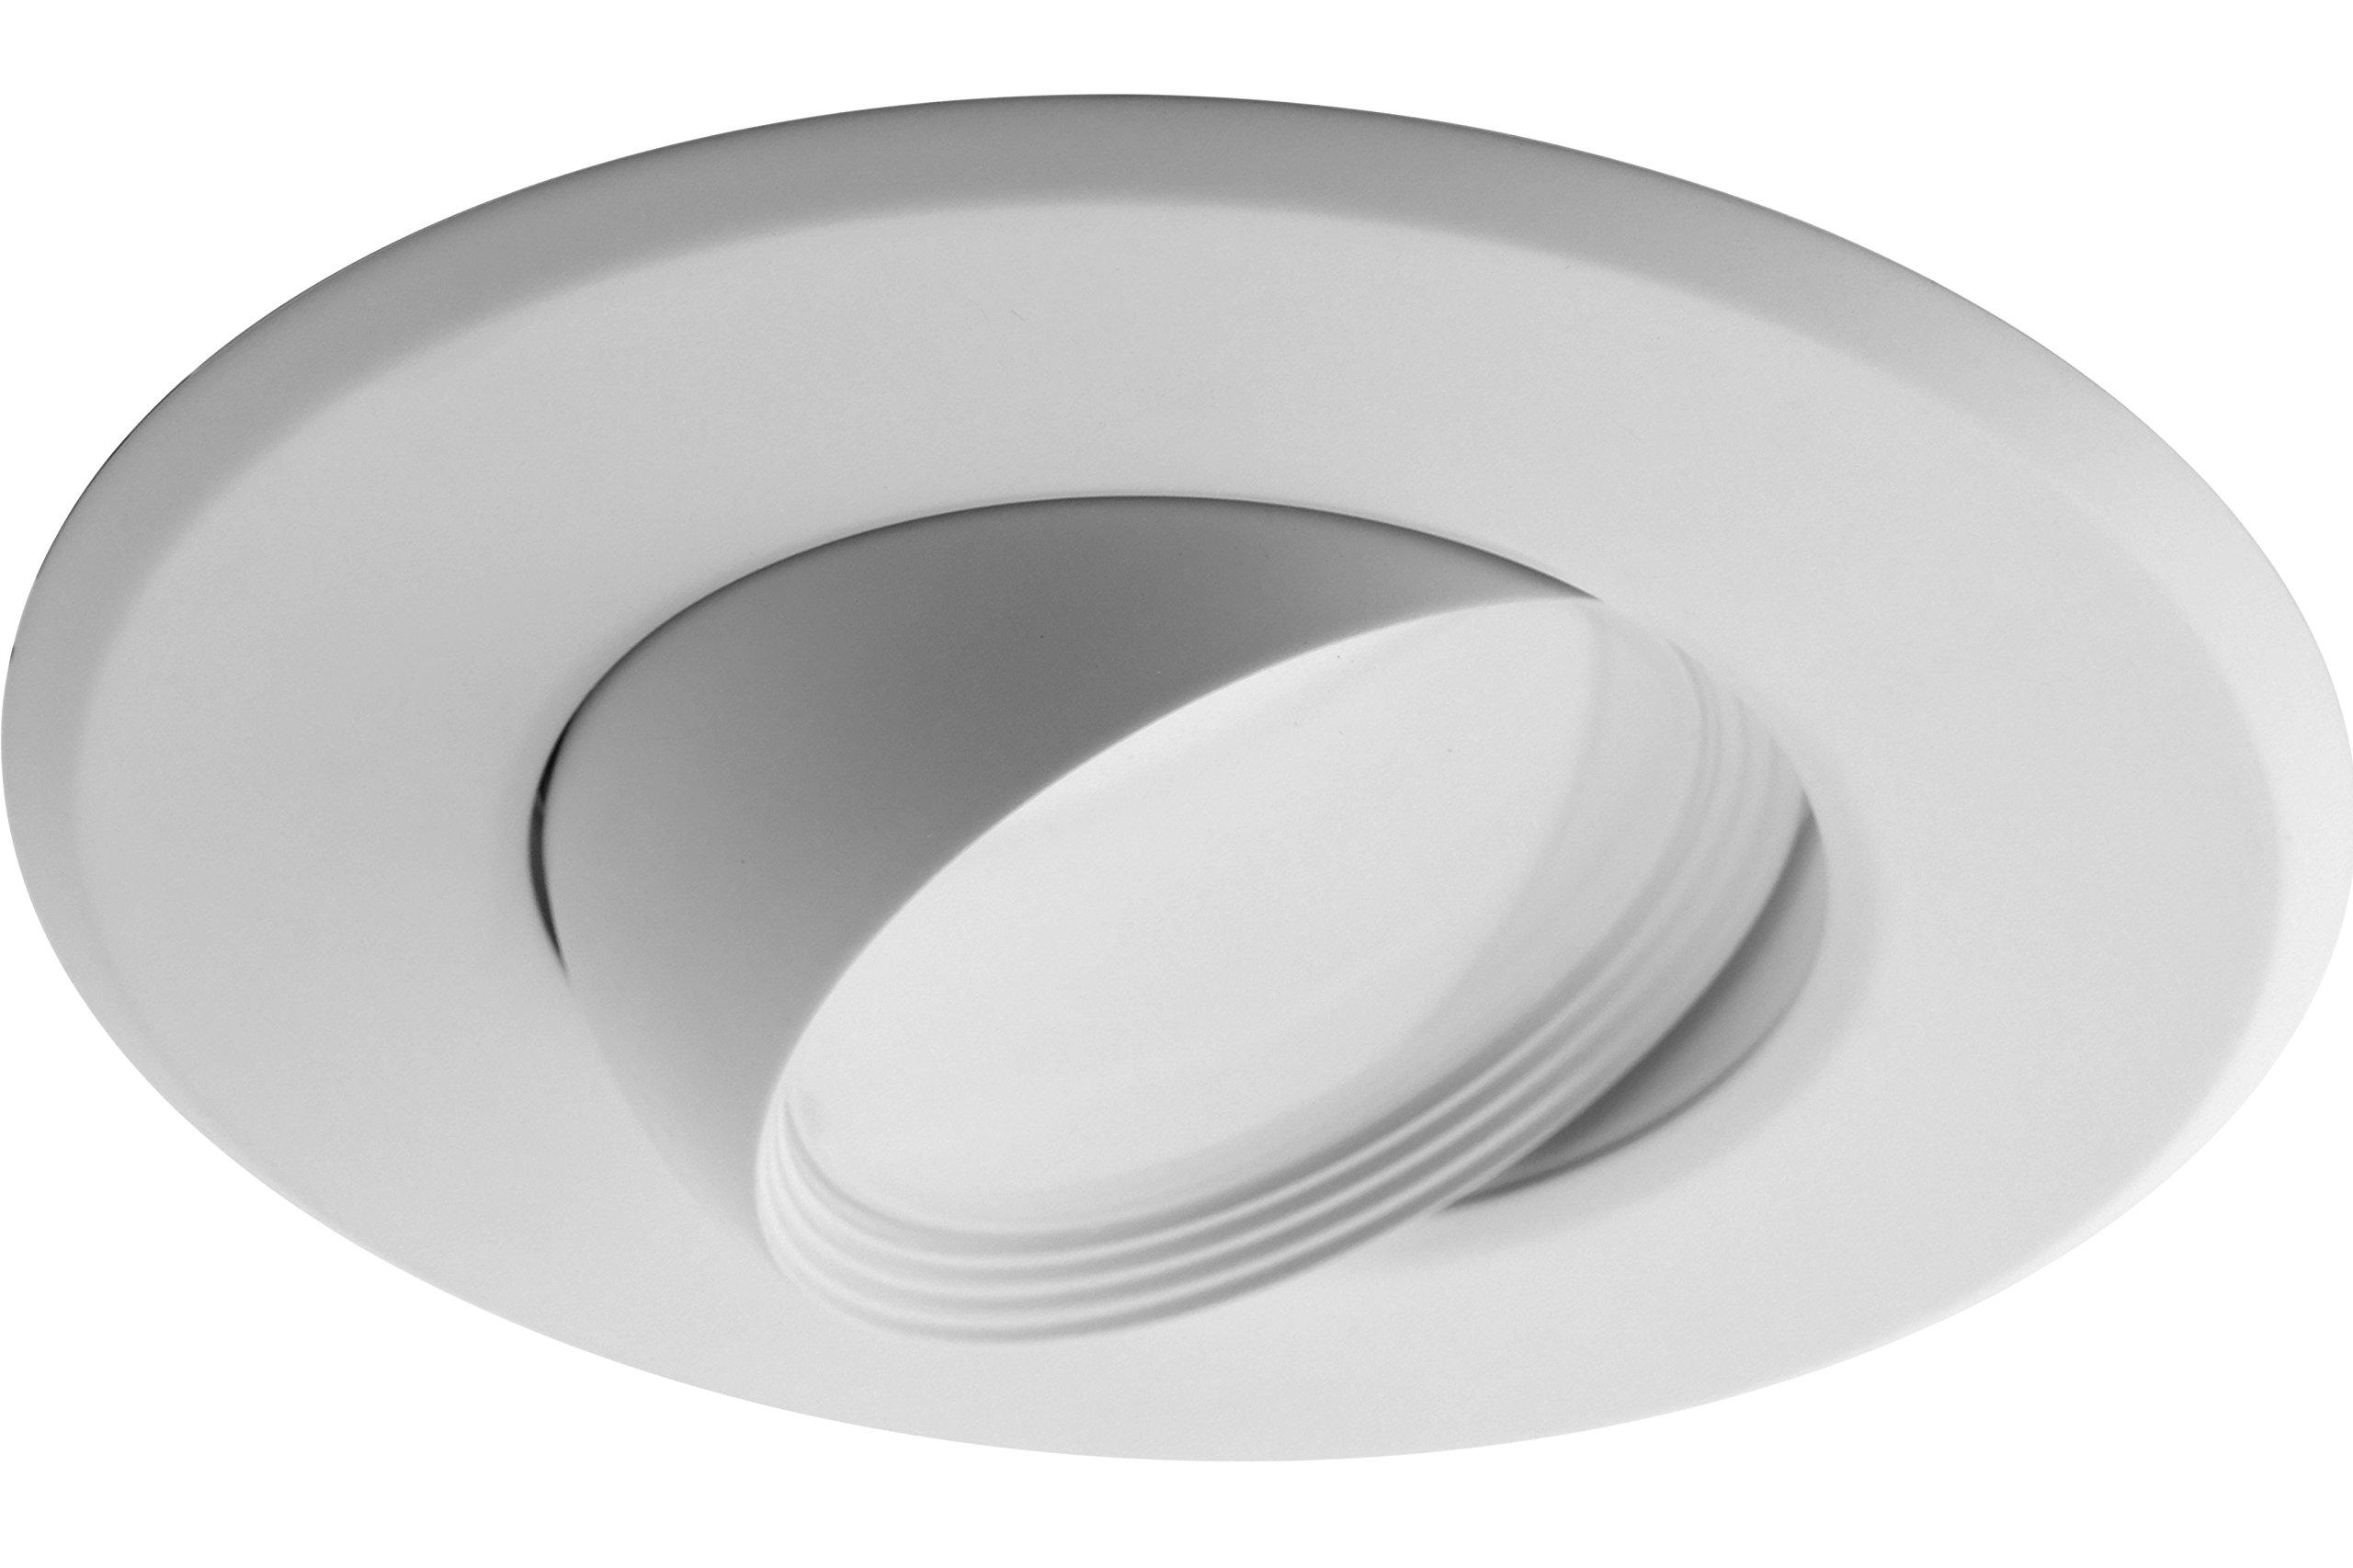 NICOR Lighting 5/6-Inch Dimmable 2700K Adjustable Eyeball LED Recessed Retrofit Downlight, White (DEB56-20-120-2K-WH)